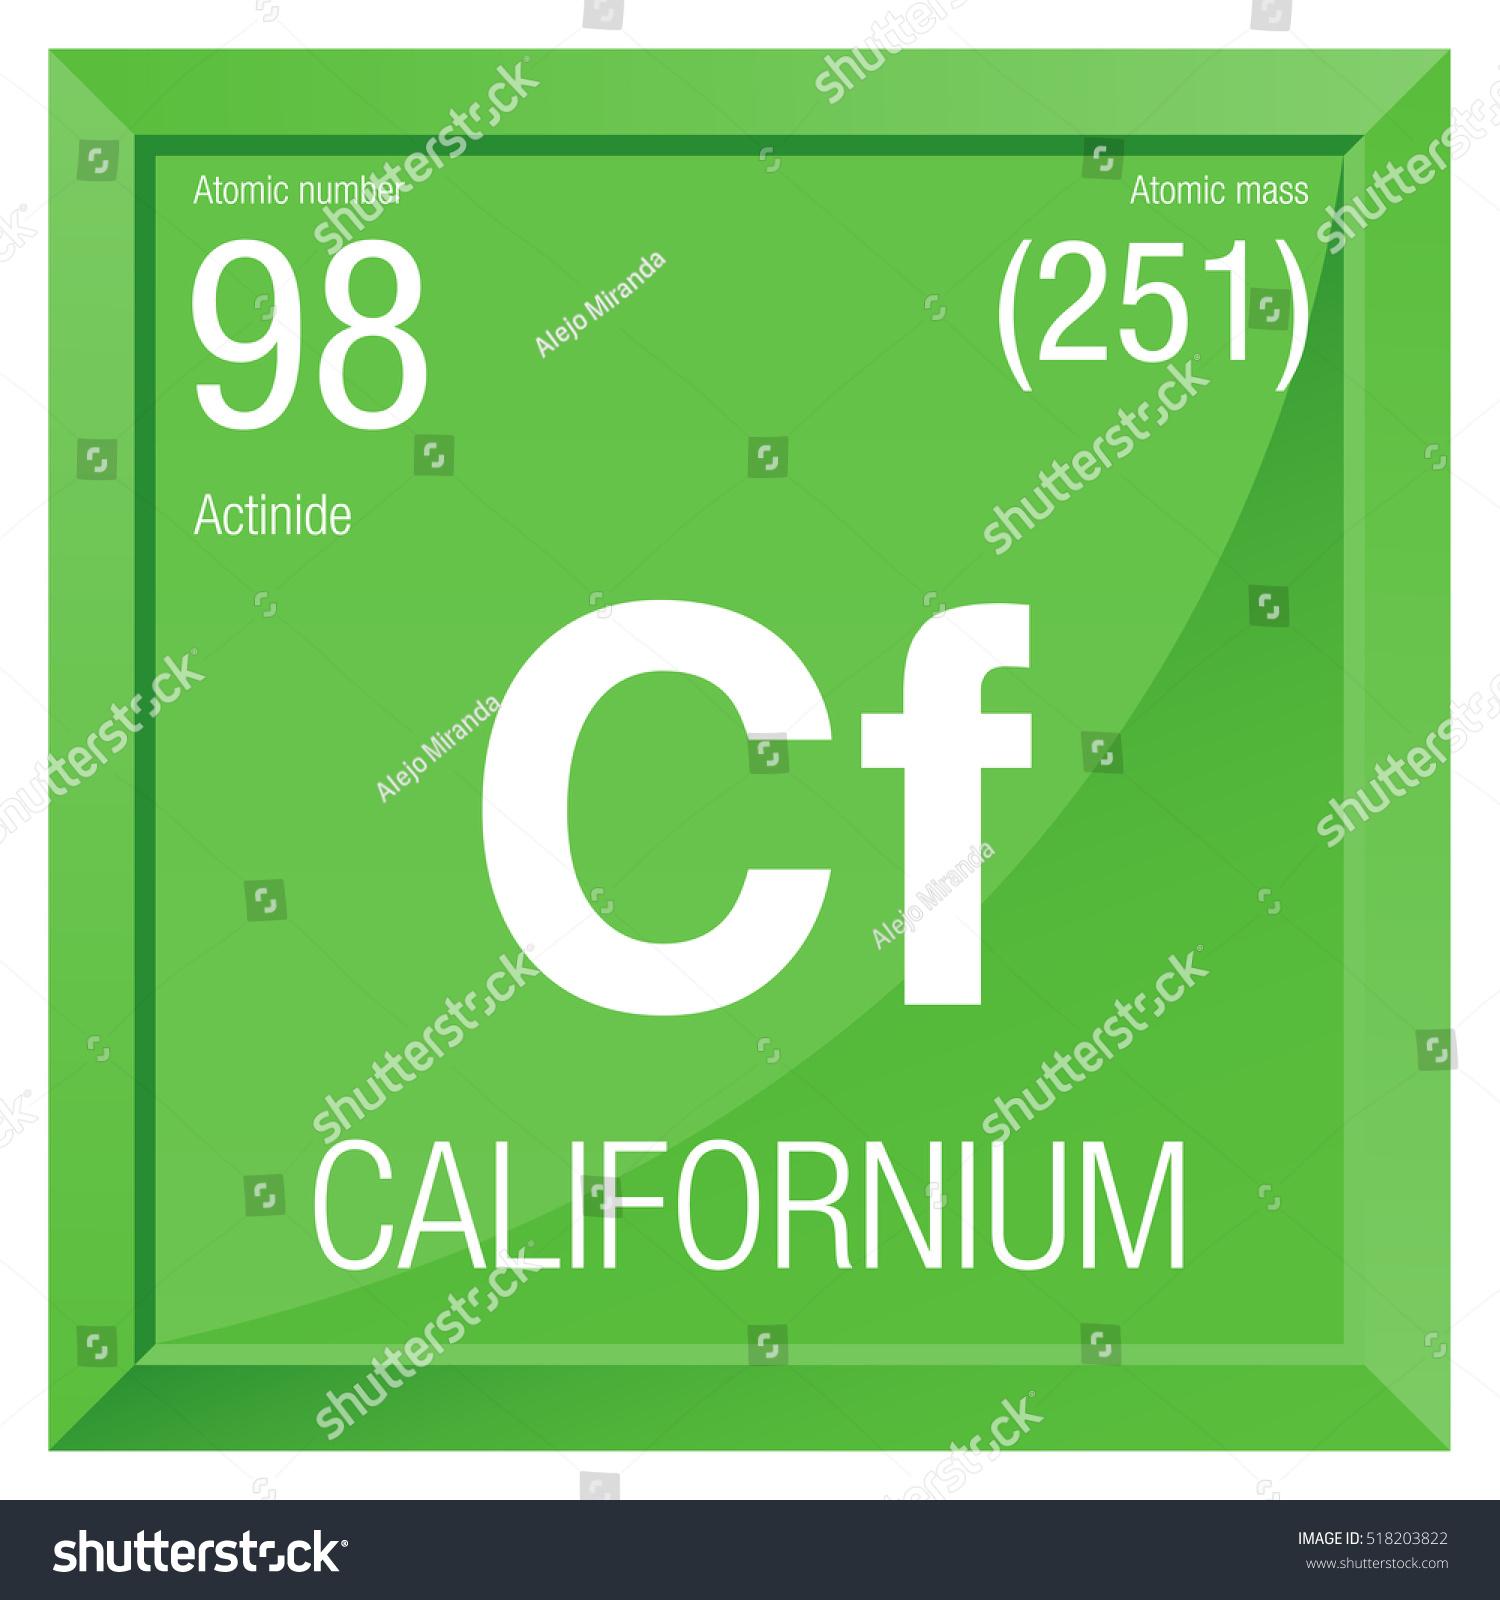 Californium symbol element number 98 periodic stock vector californium symbol element number 98 of the periodic table of the elements chemistry gamestrikefo Images